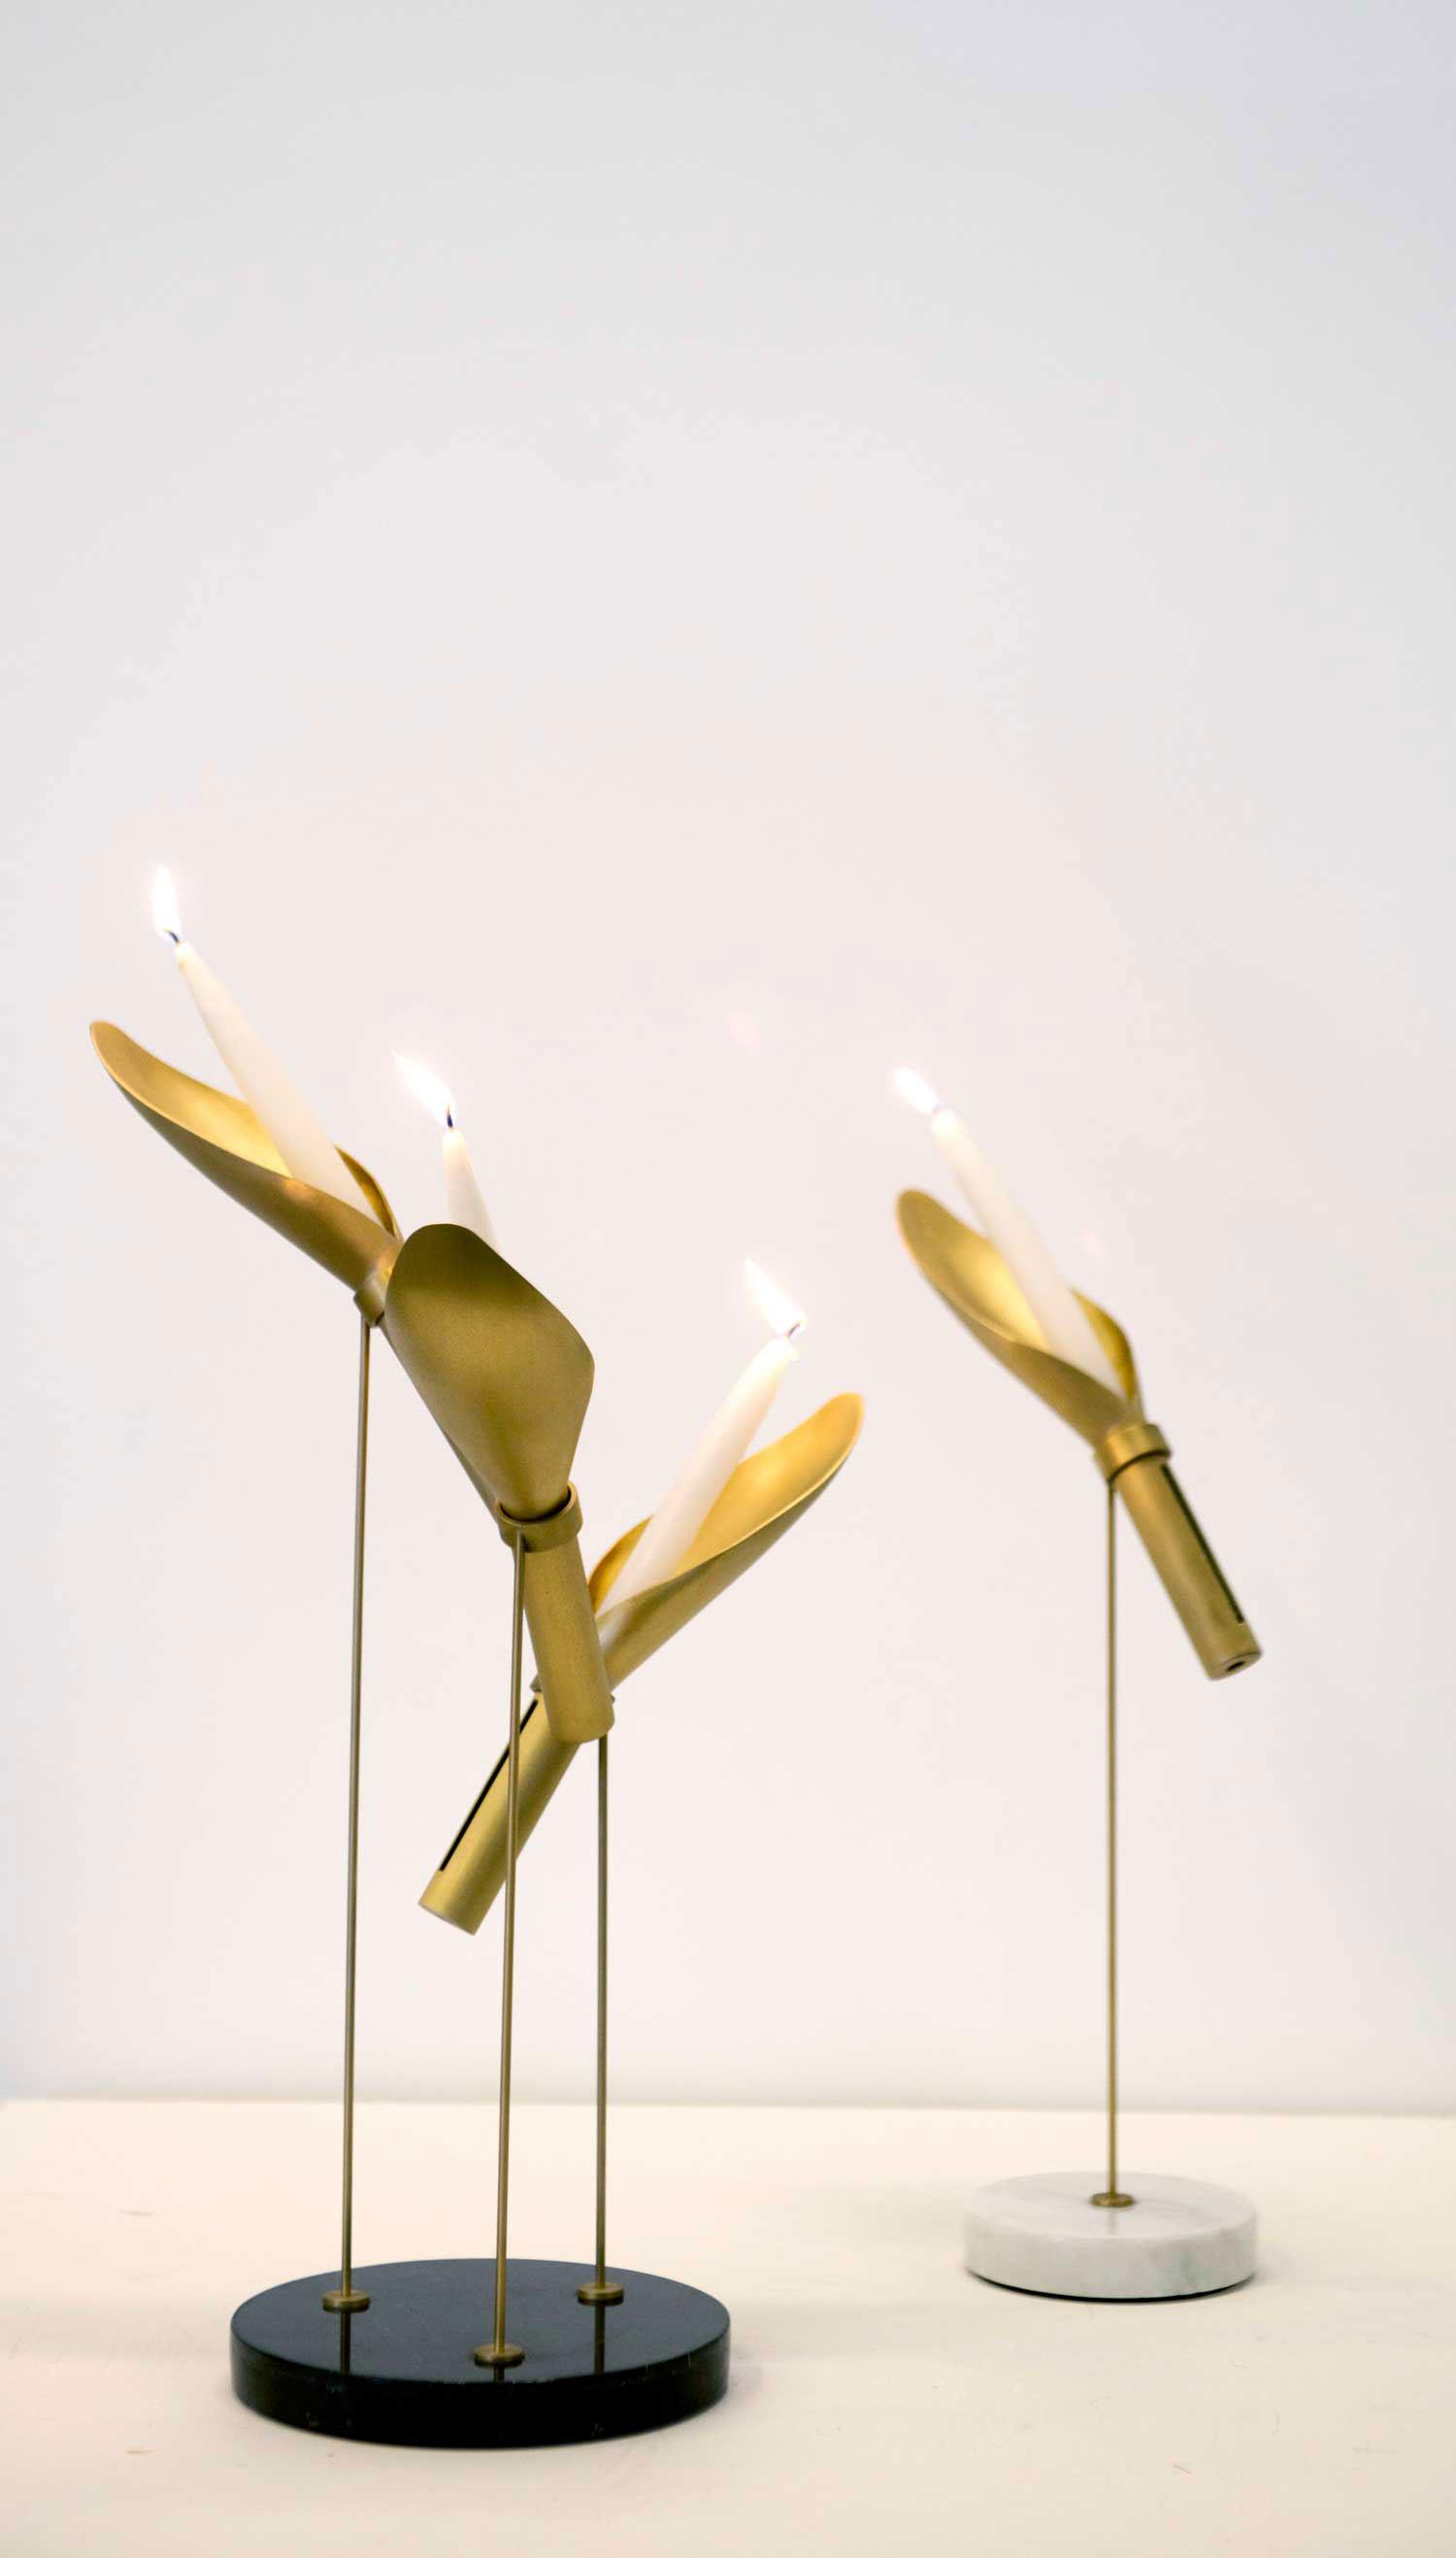 Karim Chaya for Spockdesign, Triplette, Simplette, Oblique at Design Days Dubai 2014   Yellowtrace